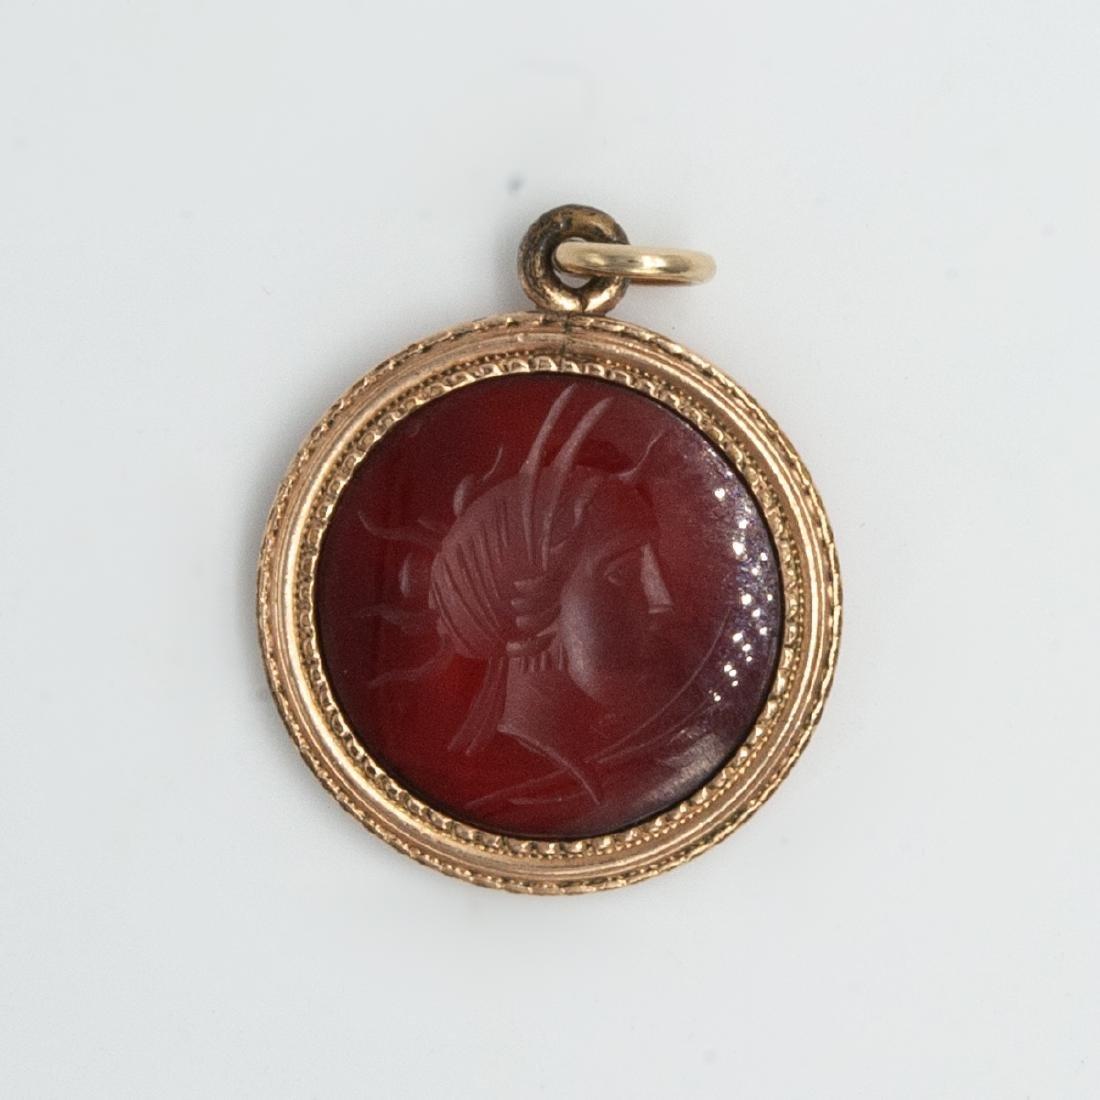 Vintage Red Carnelian Intaglio Pendant - 3